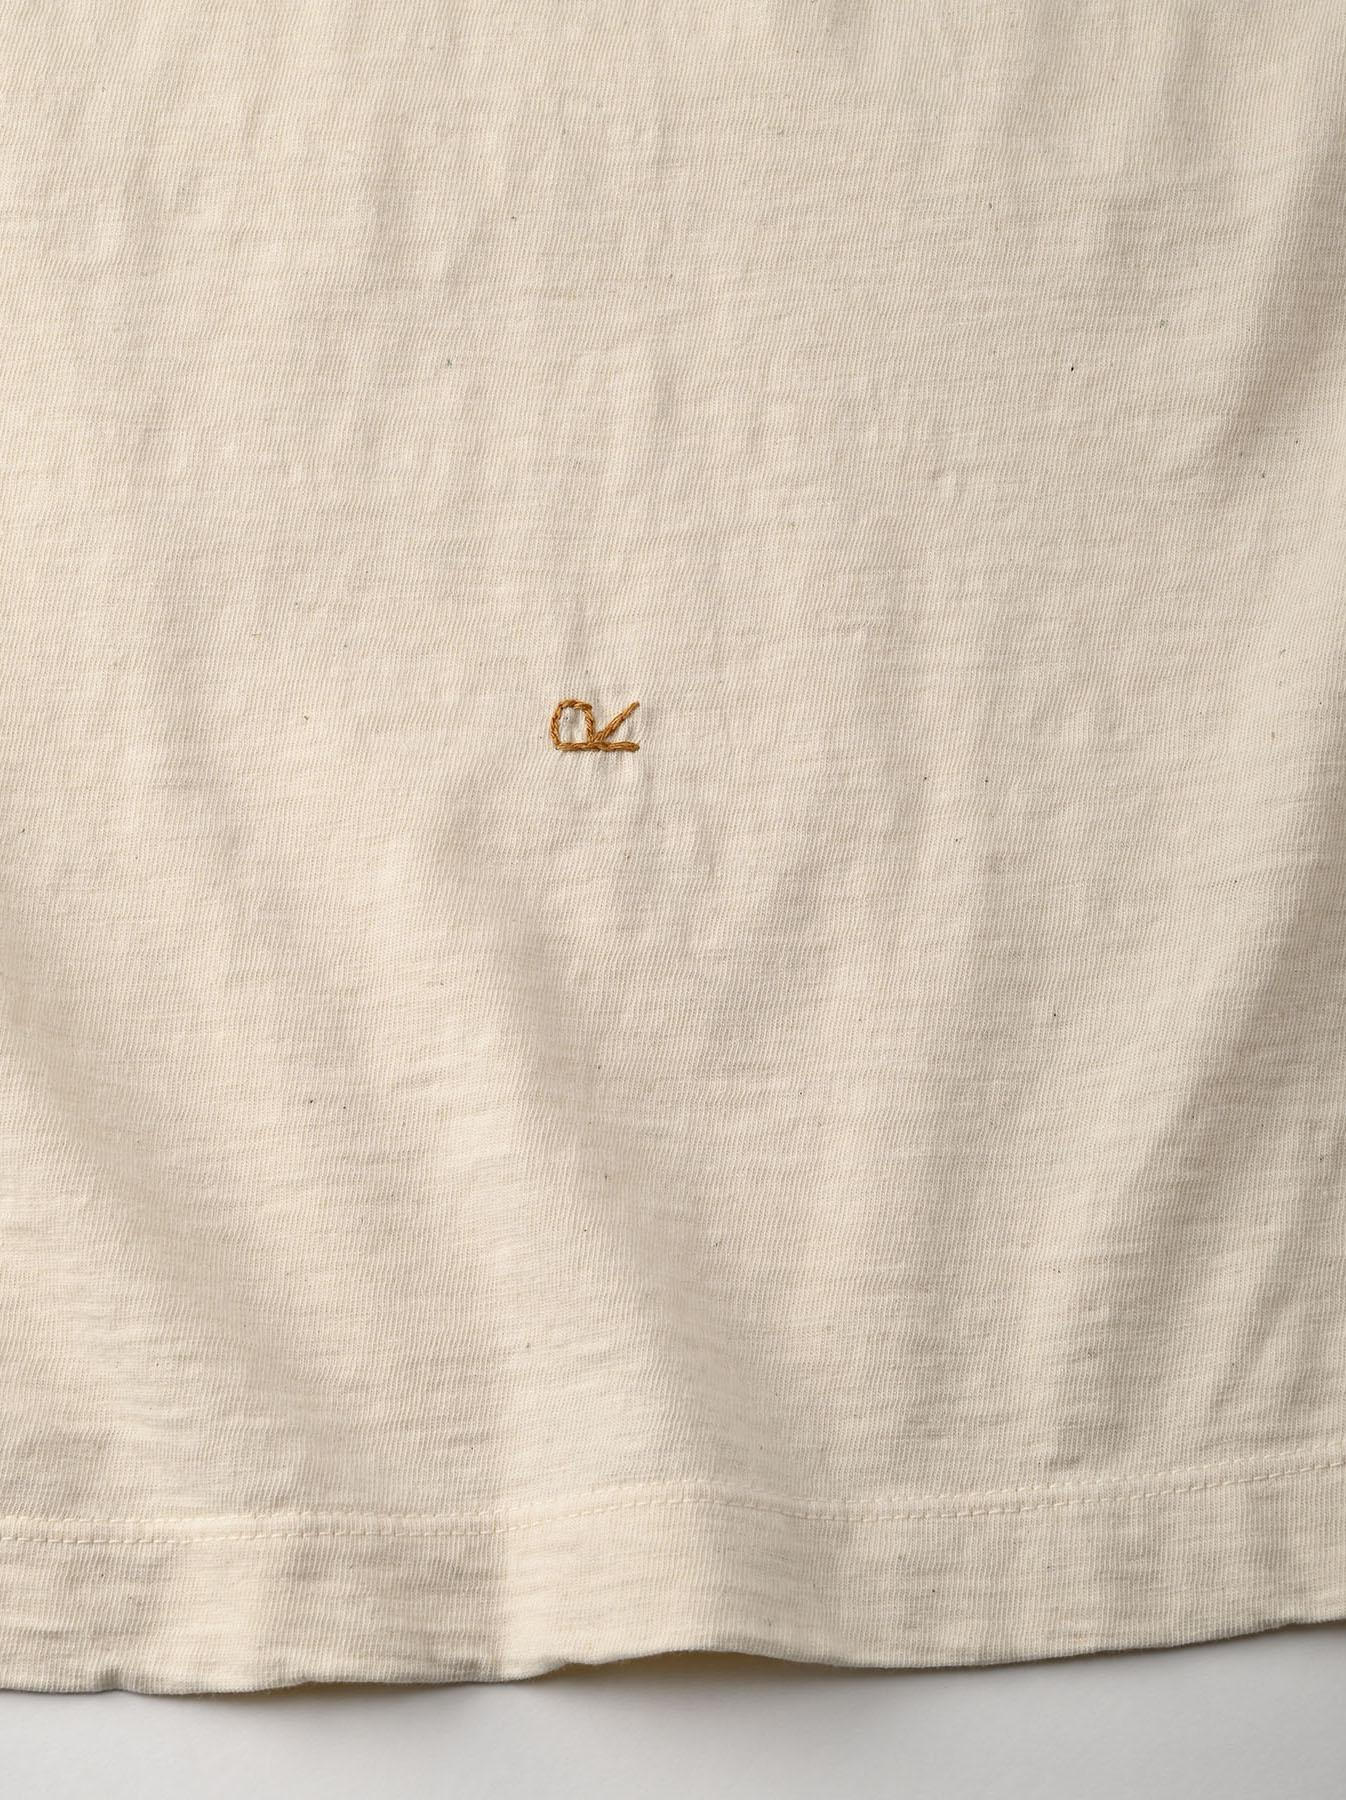 Hayama-kun Embroidered 908 Ocean T-shirt (0621)-11